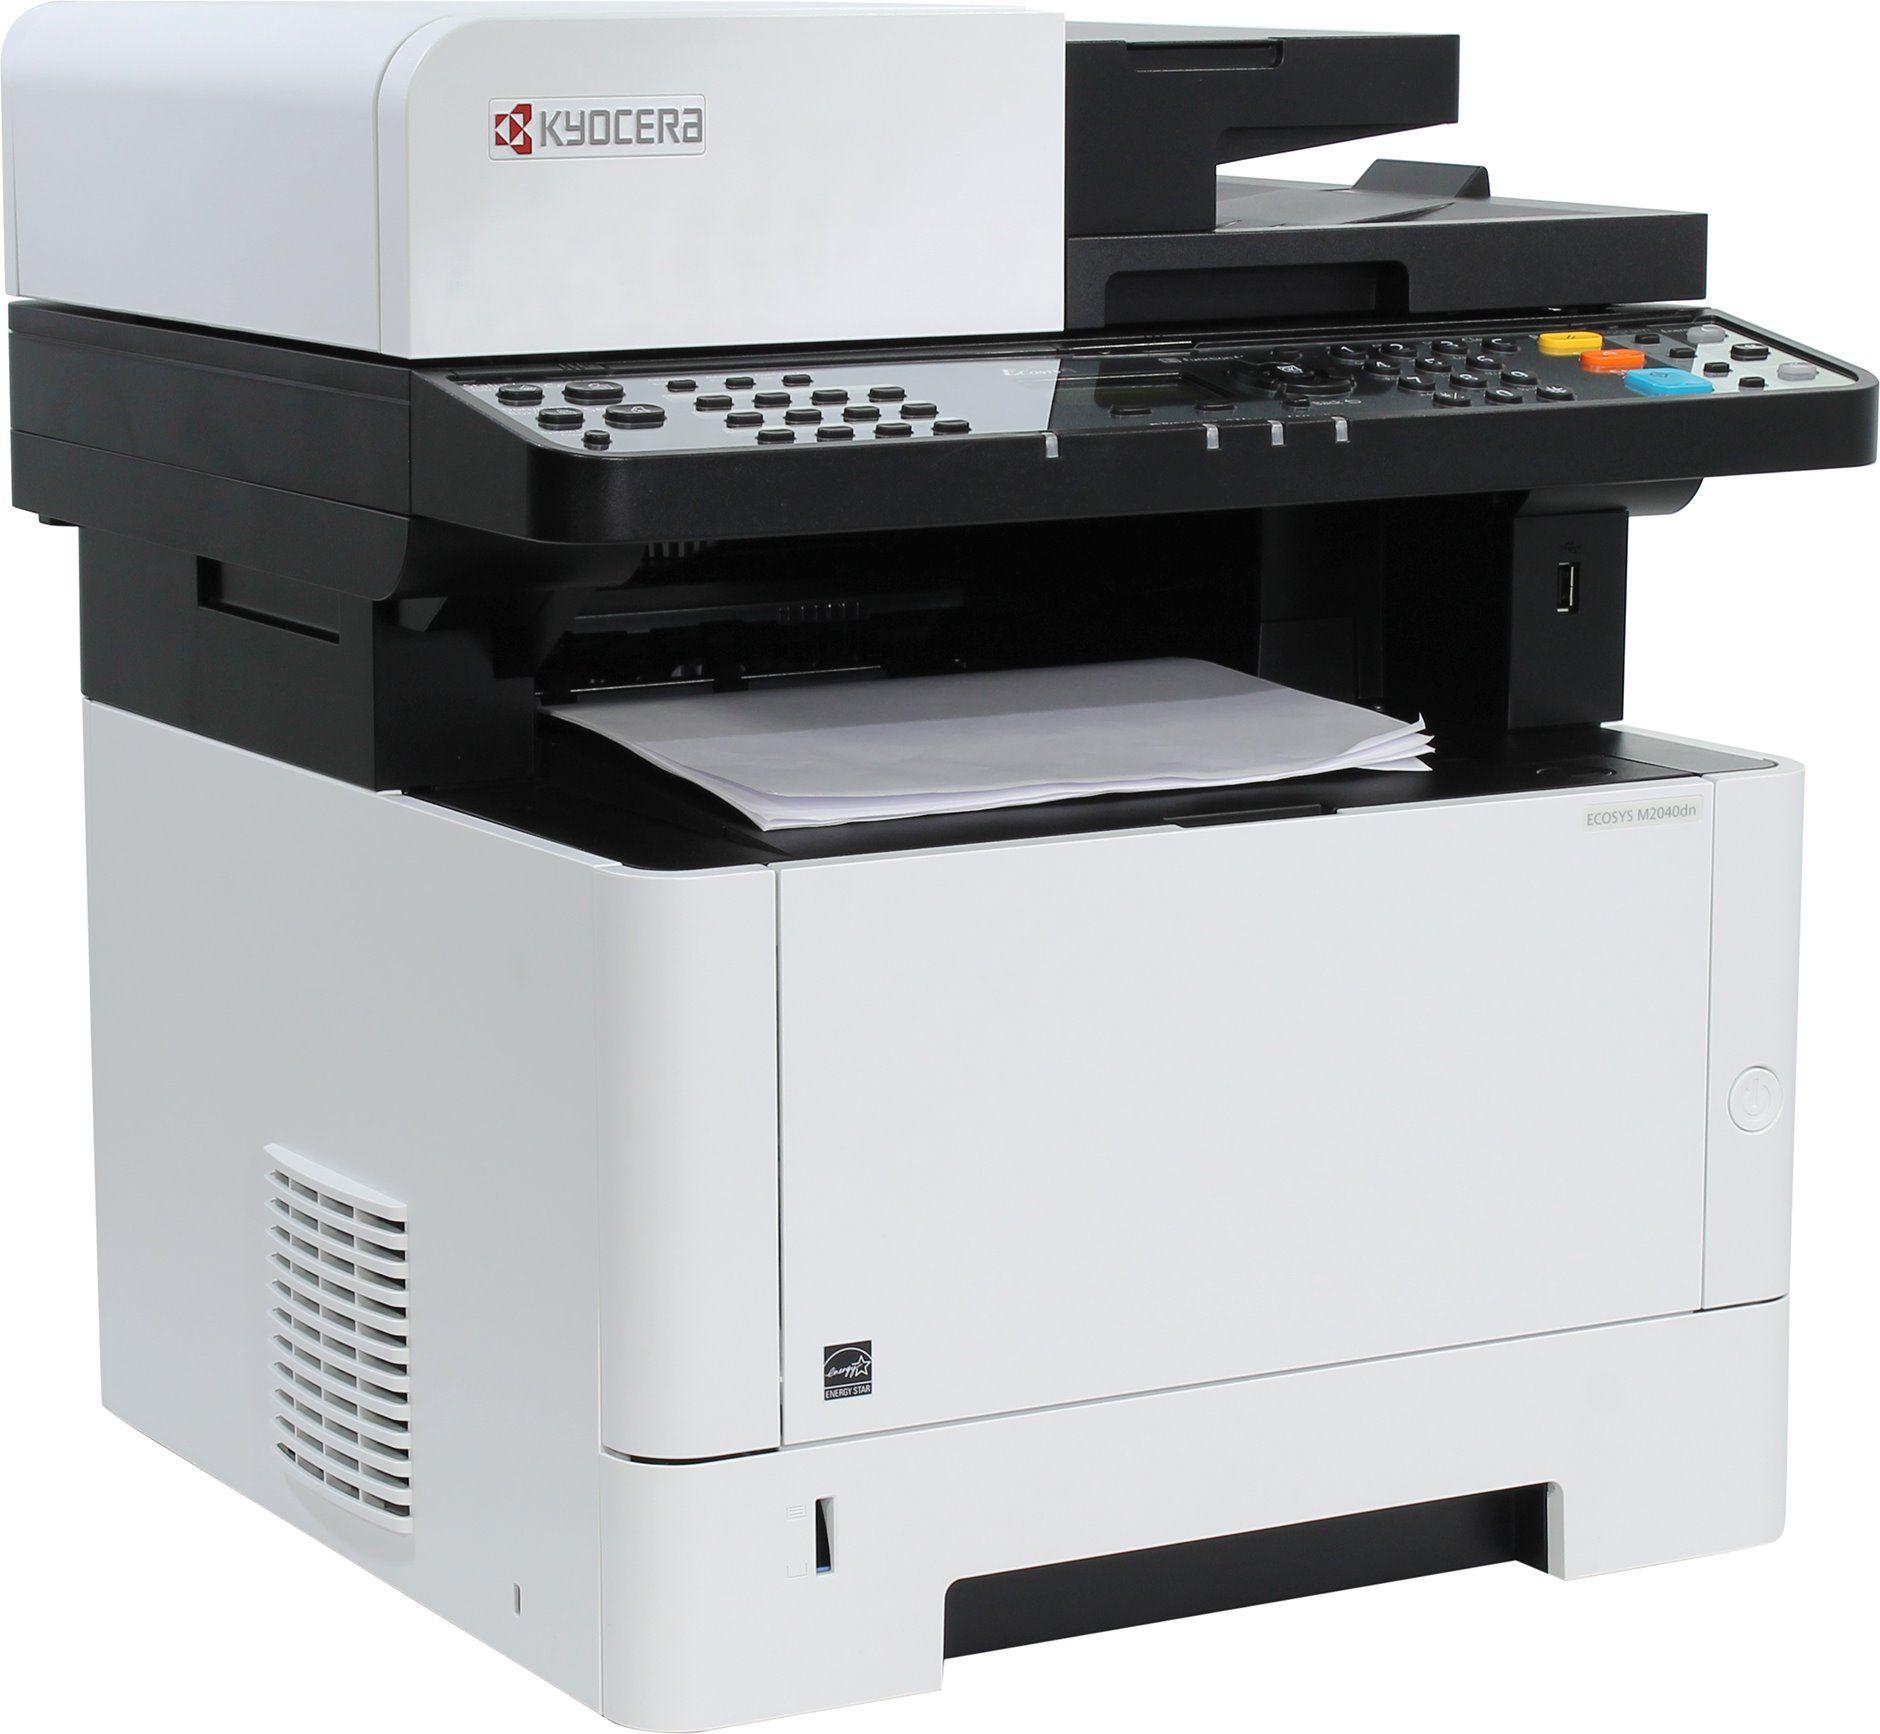 Kyocera M2040DN | Multifuncional Ecosys M2040 2040 42PPM